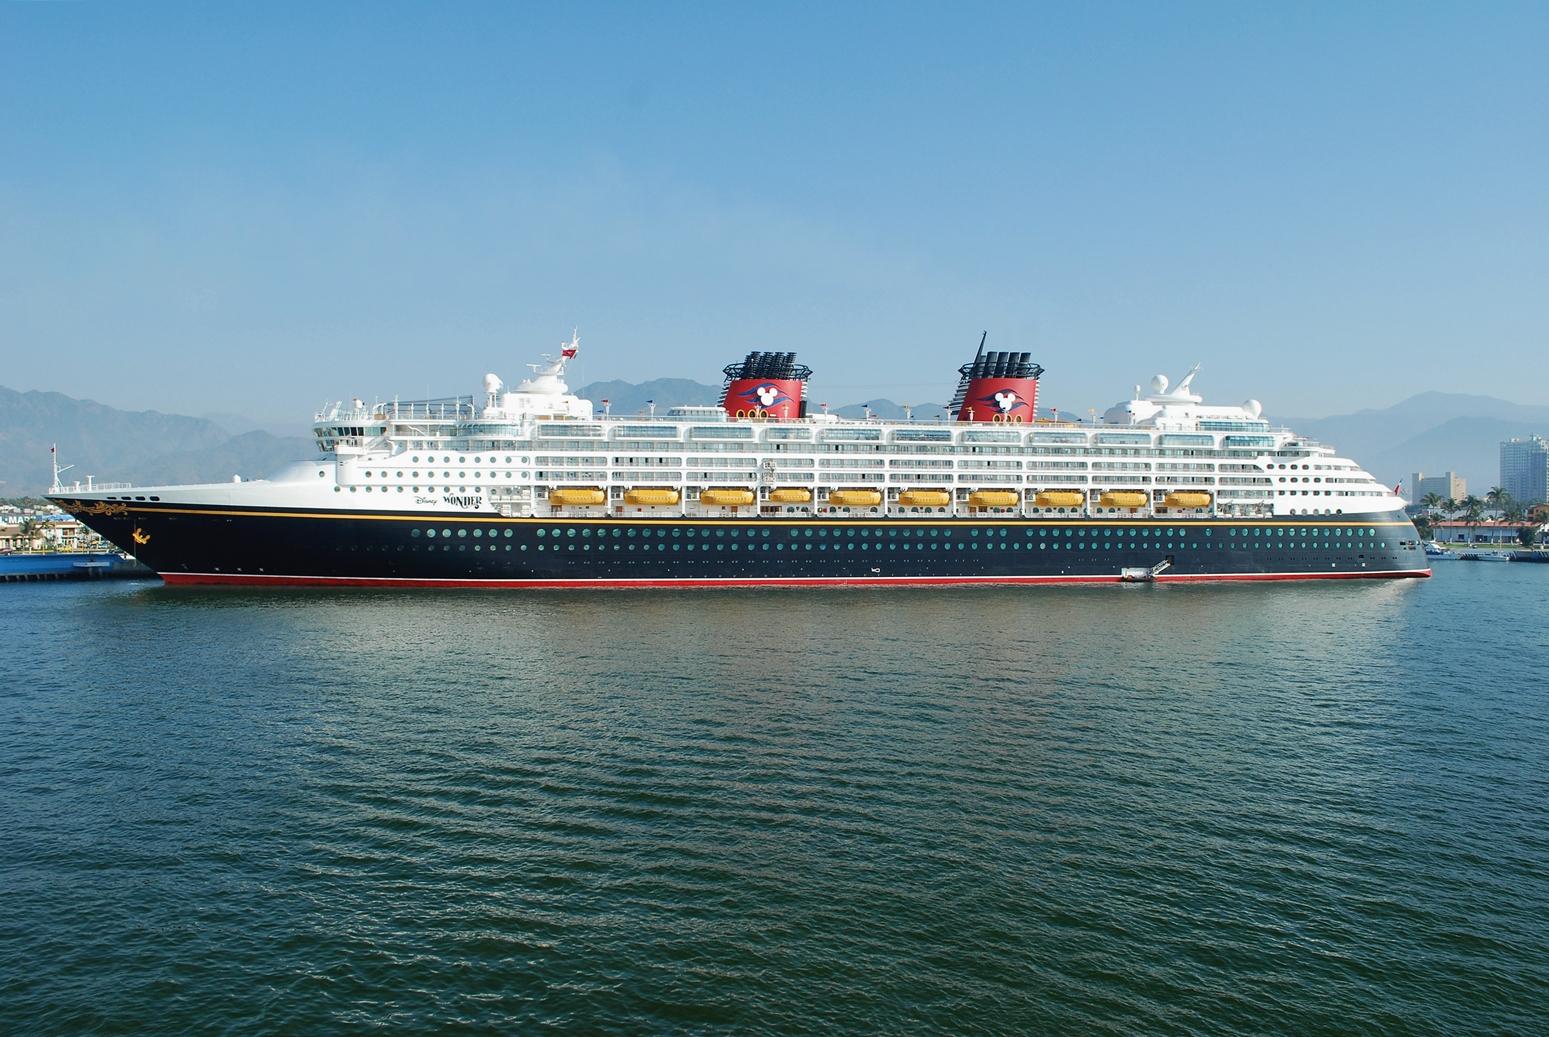 Disney Cruise Line Desktop Backgrounds for HD Wallpaper wall 1549x1037